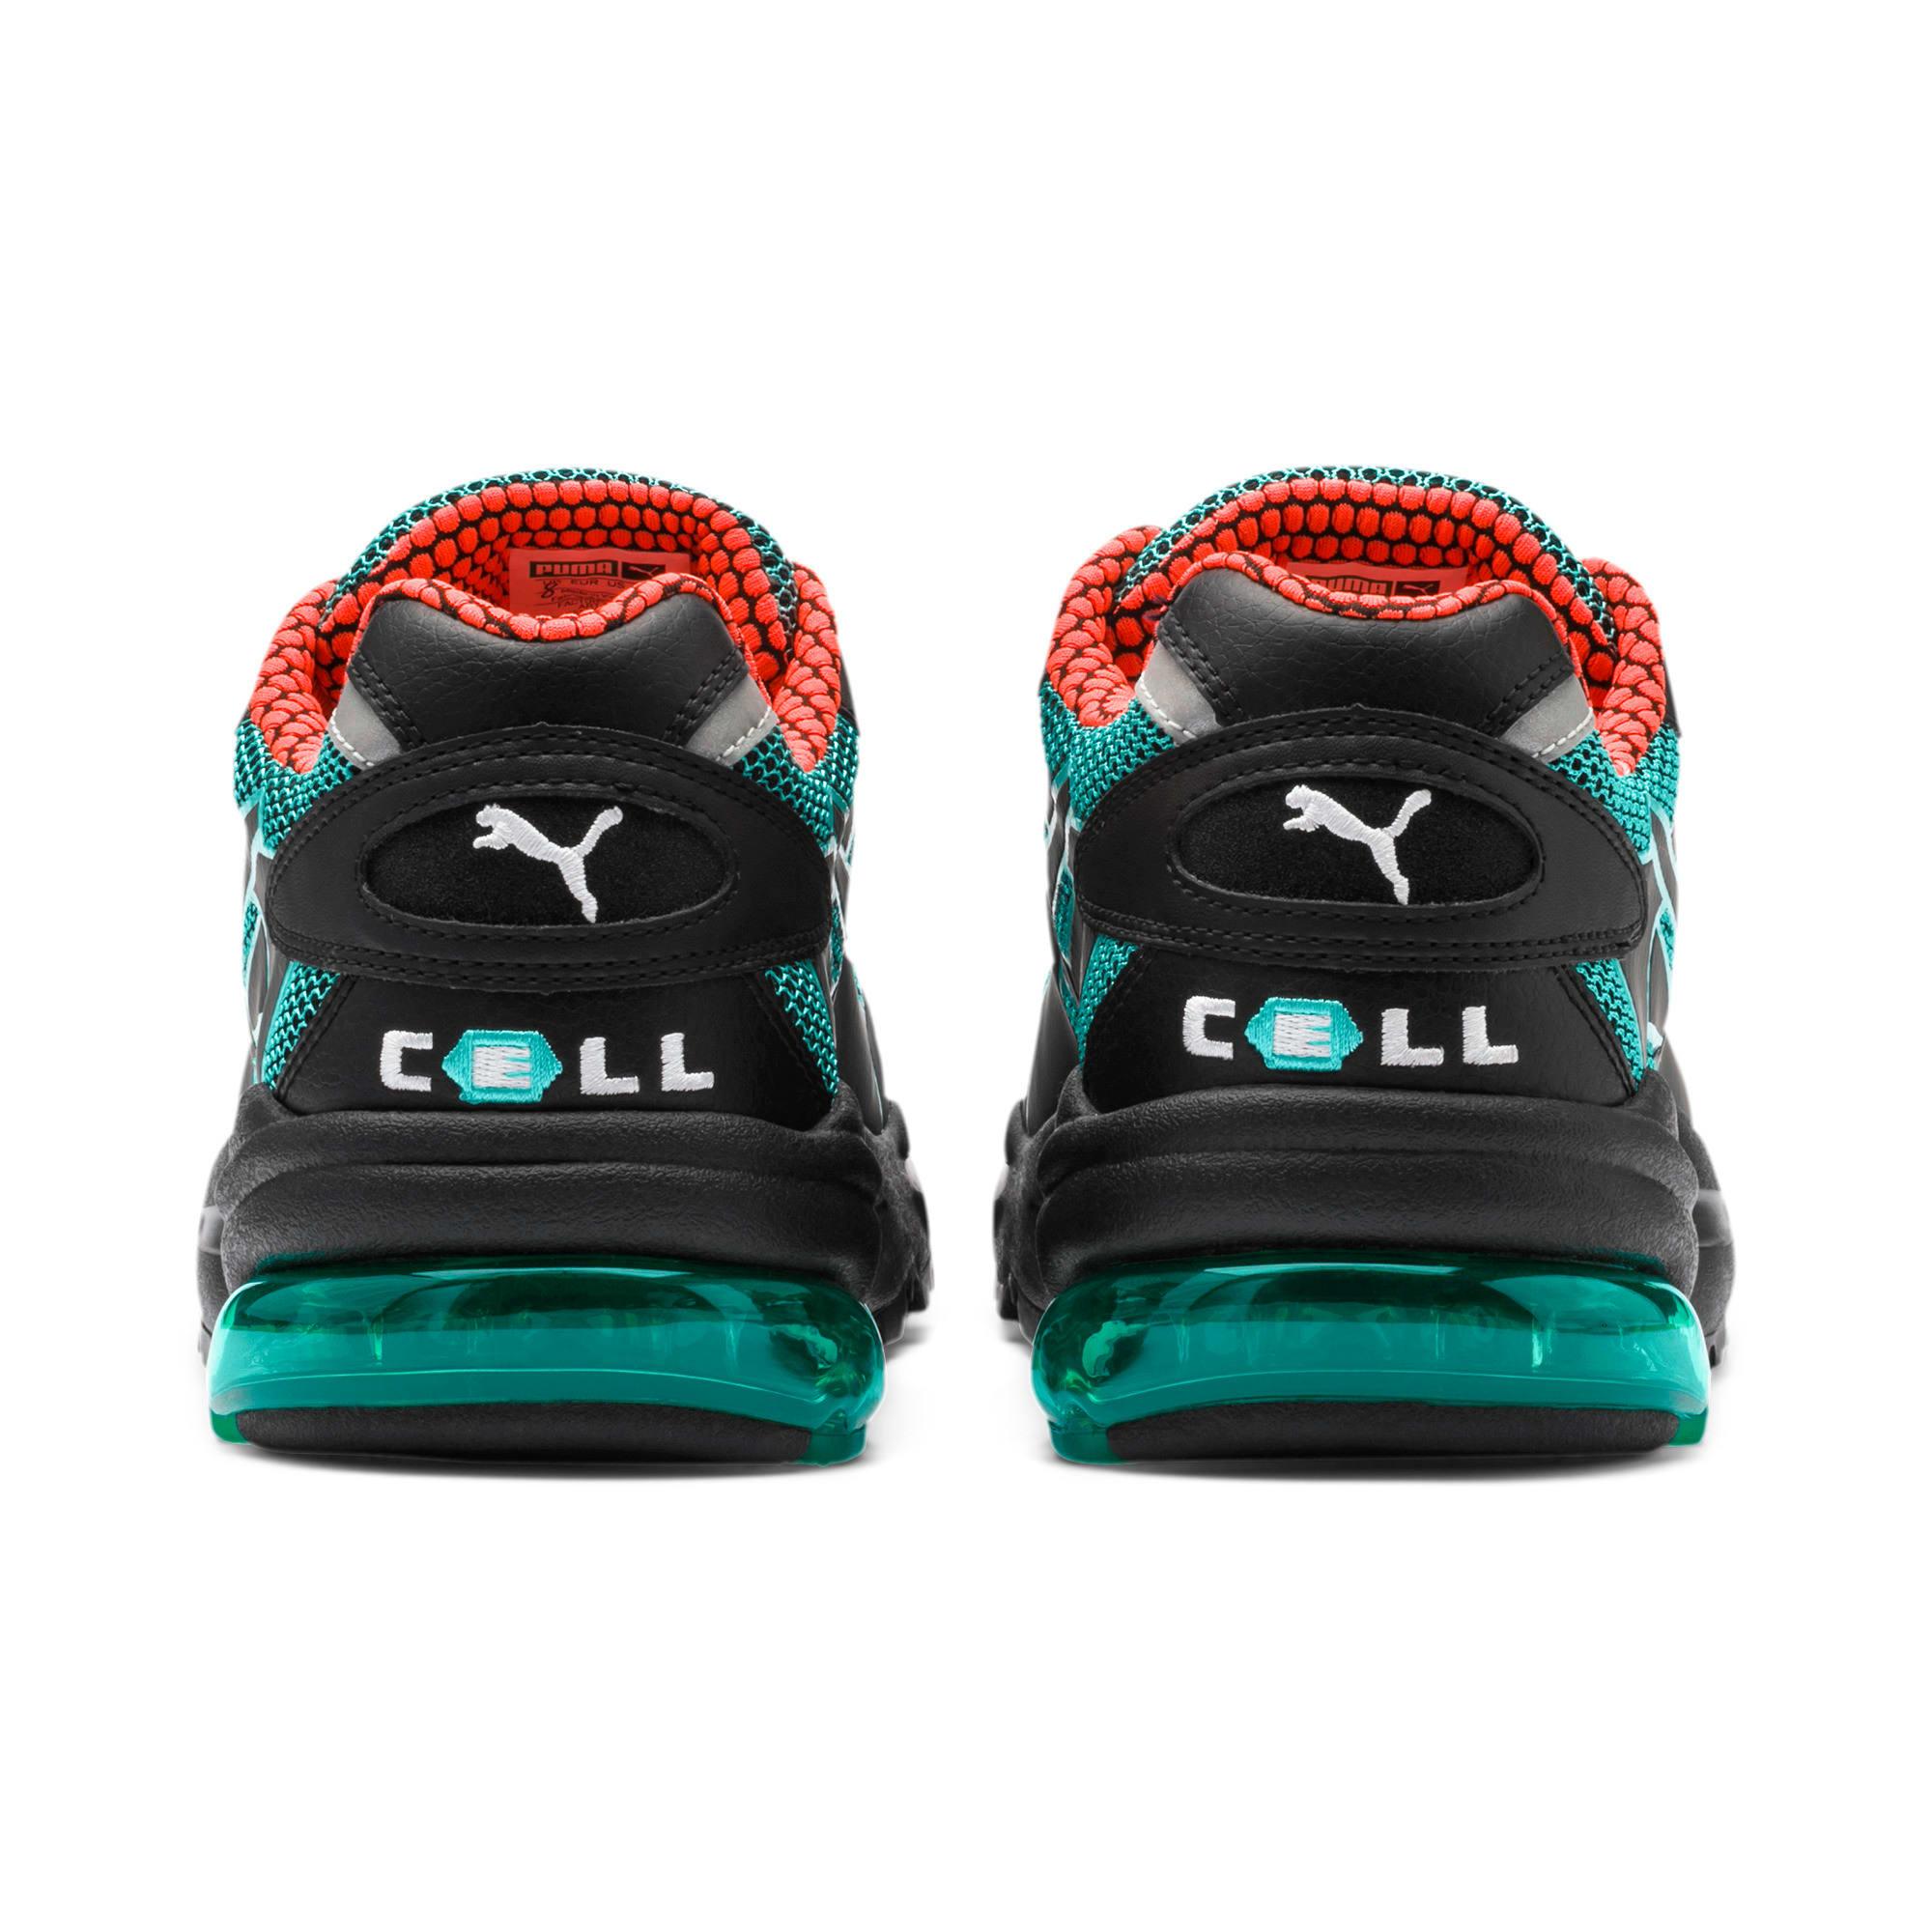 Thumbnail 4 of CELL Alien Kotto Sneakers, Puma Black-Blue Turquoise, medium